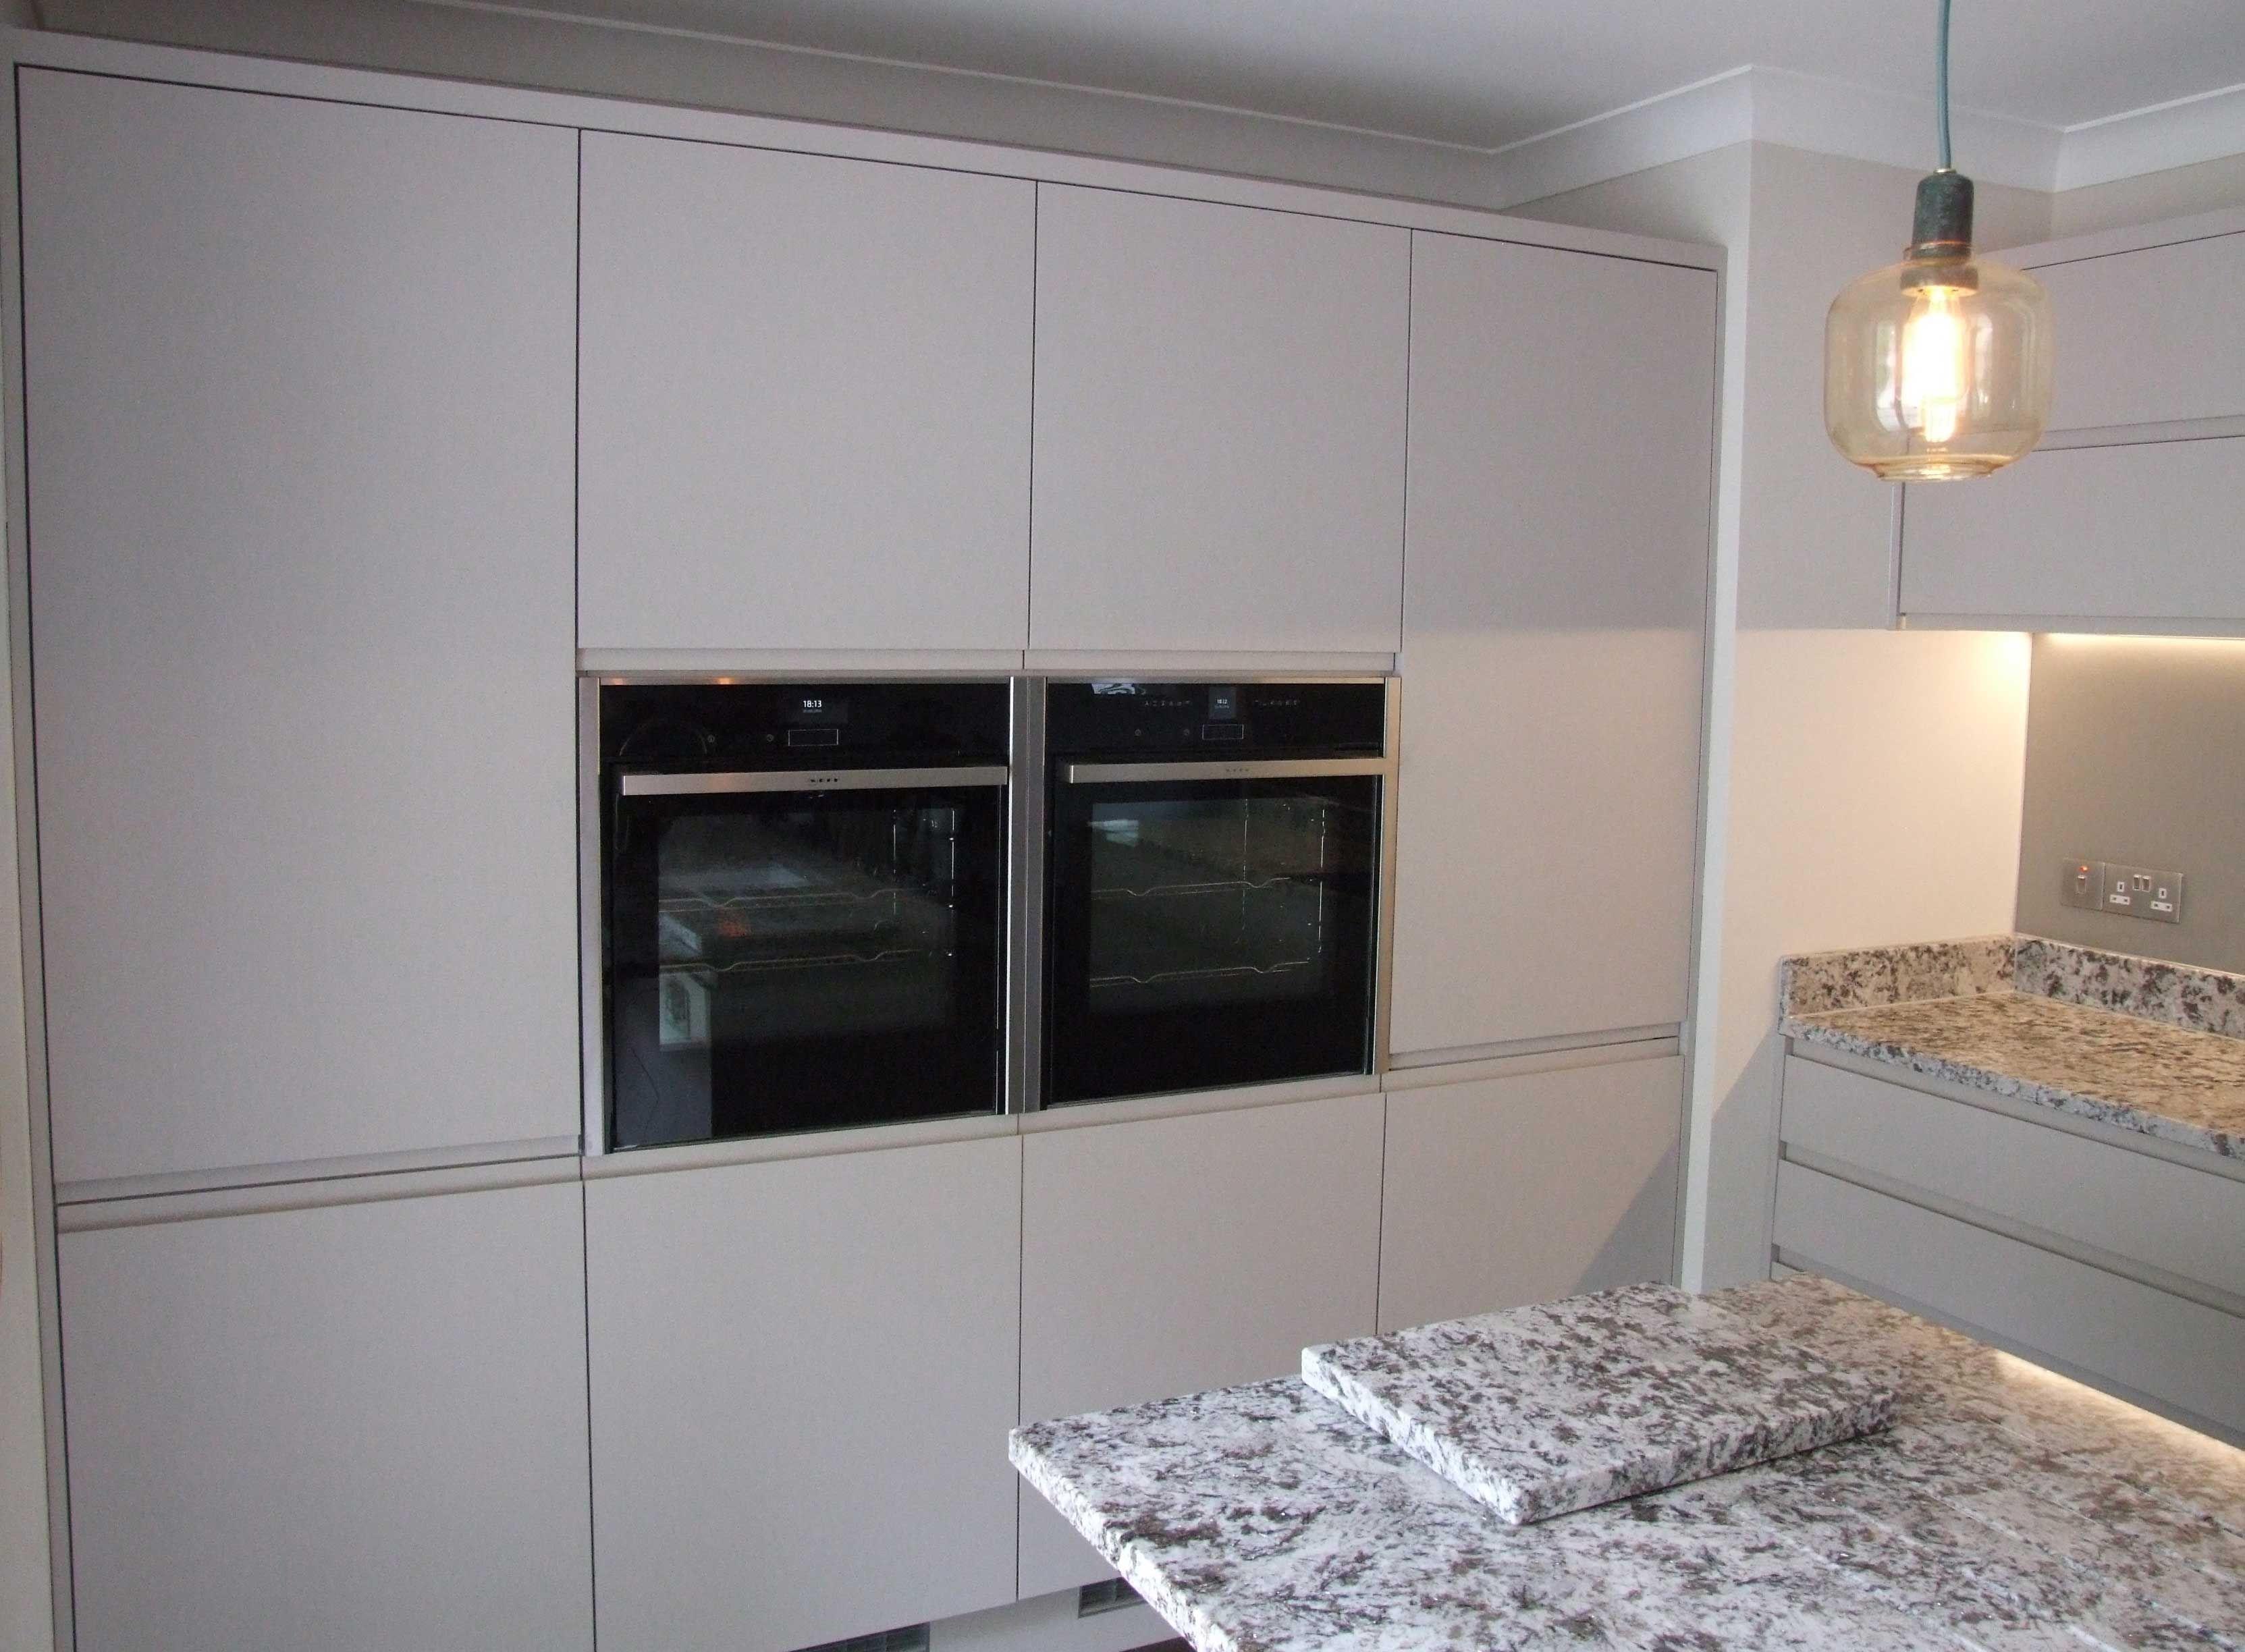 Matt Cashmere Handleless Handleless Kitchen Cashmere Kitchen Kitchen Inspirations